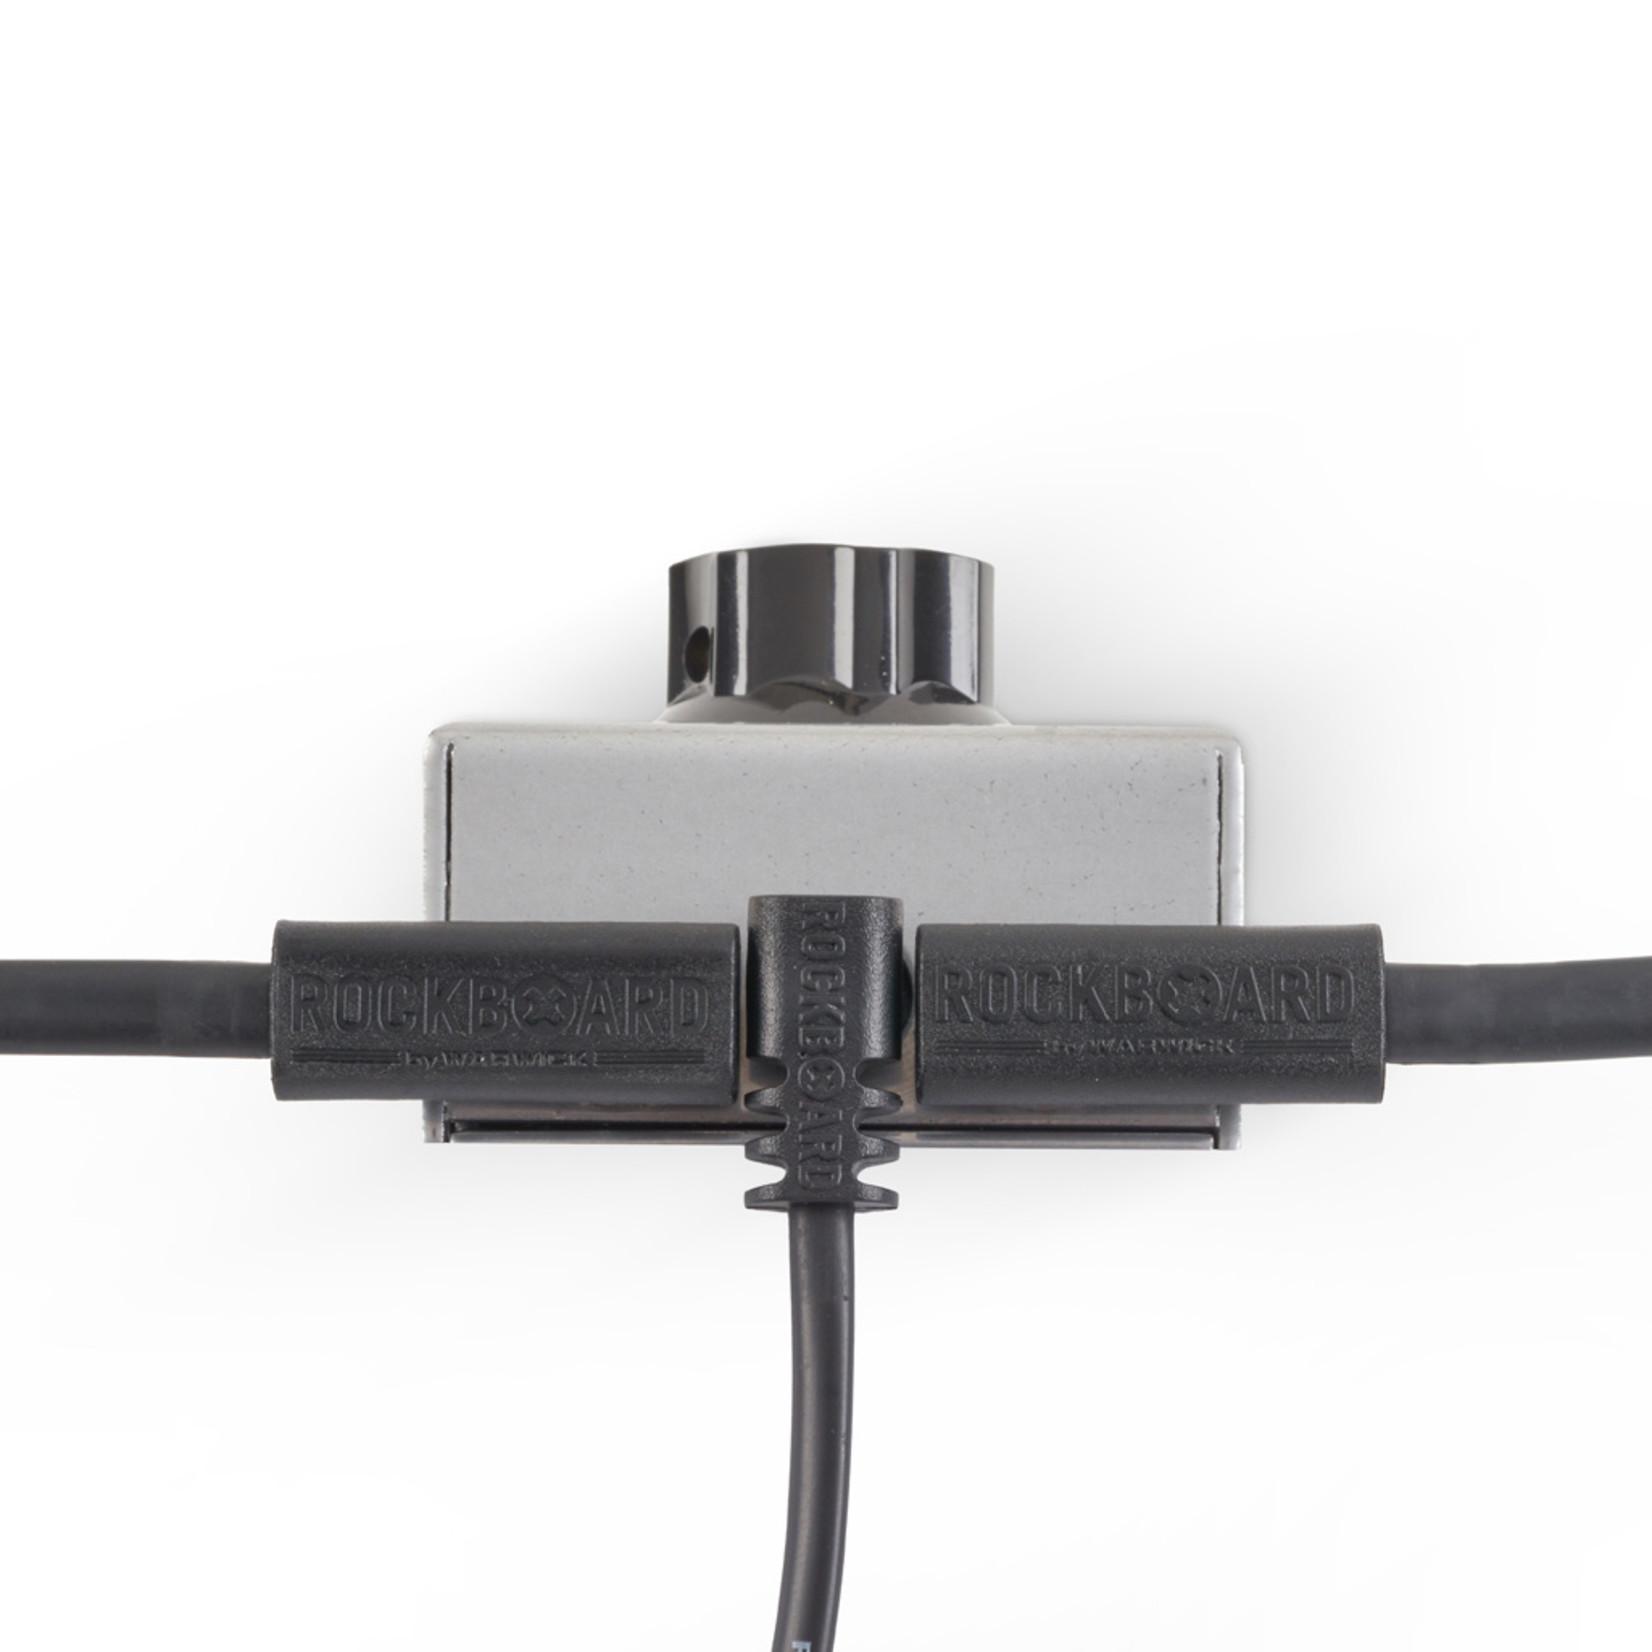 "Rockboard RockBoard Flat Power Cable - Angled/Straight - 15 cm / 5 29/32"""